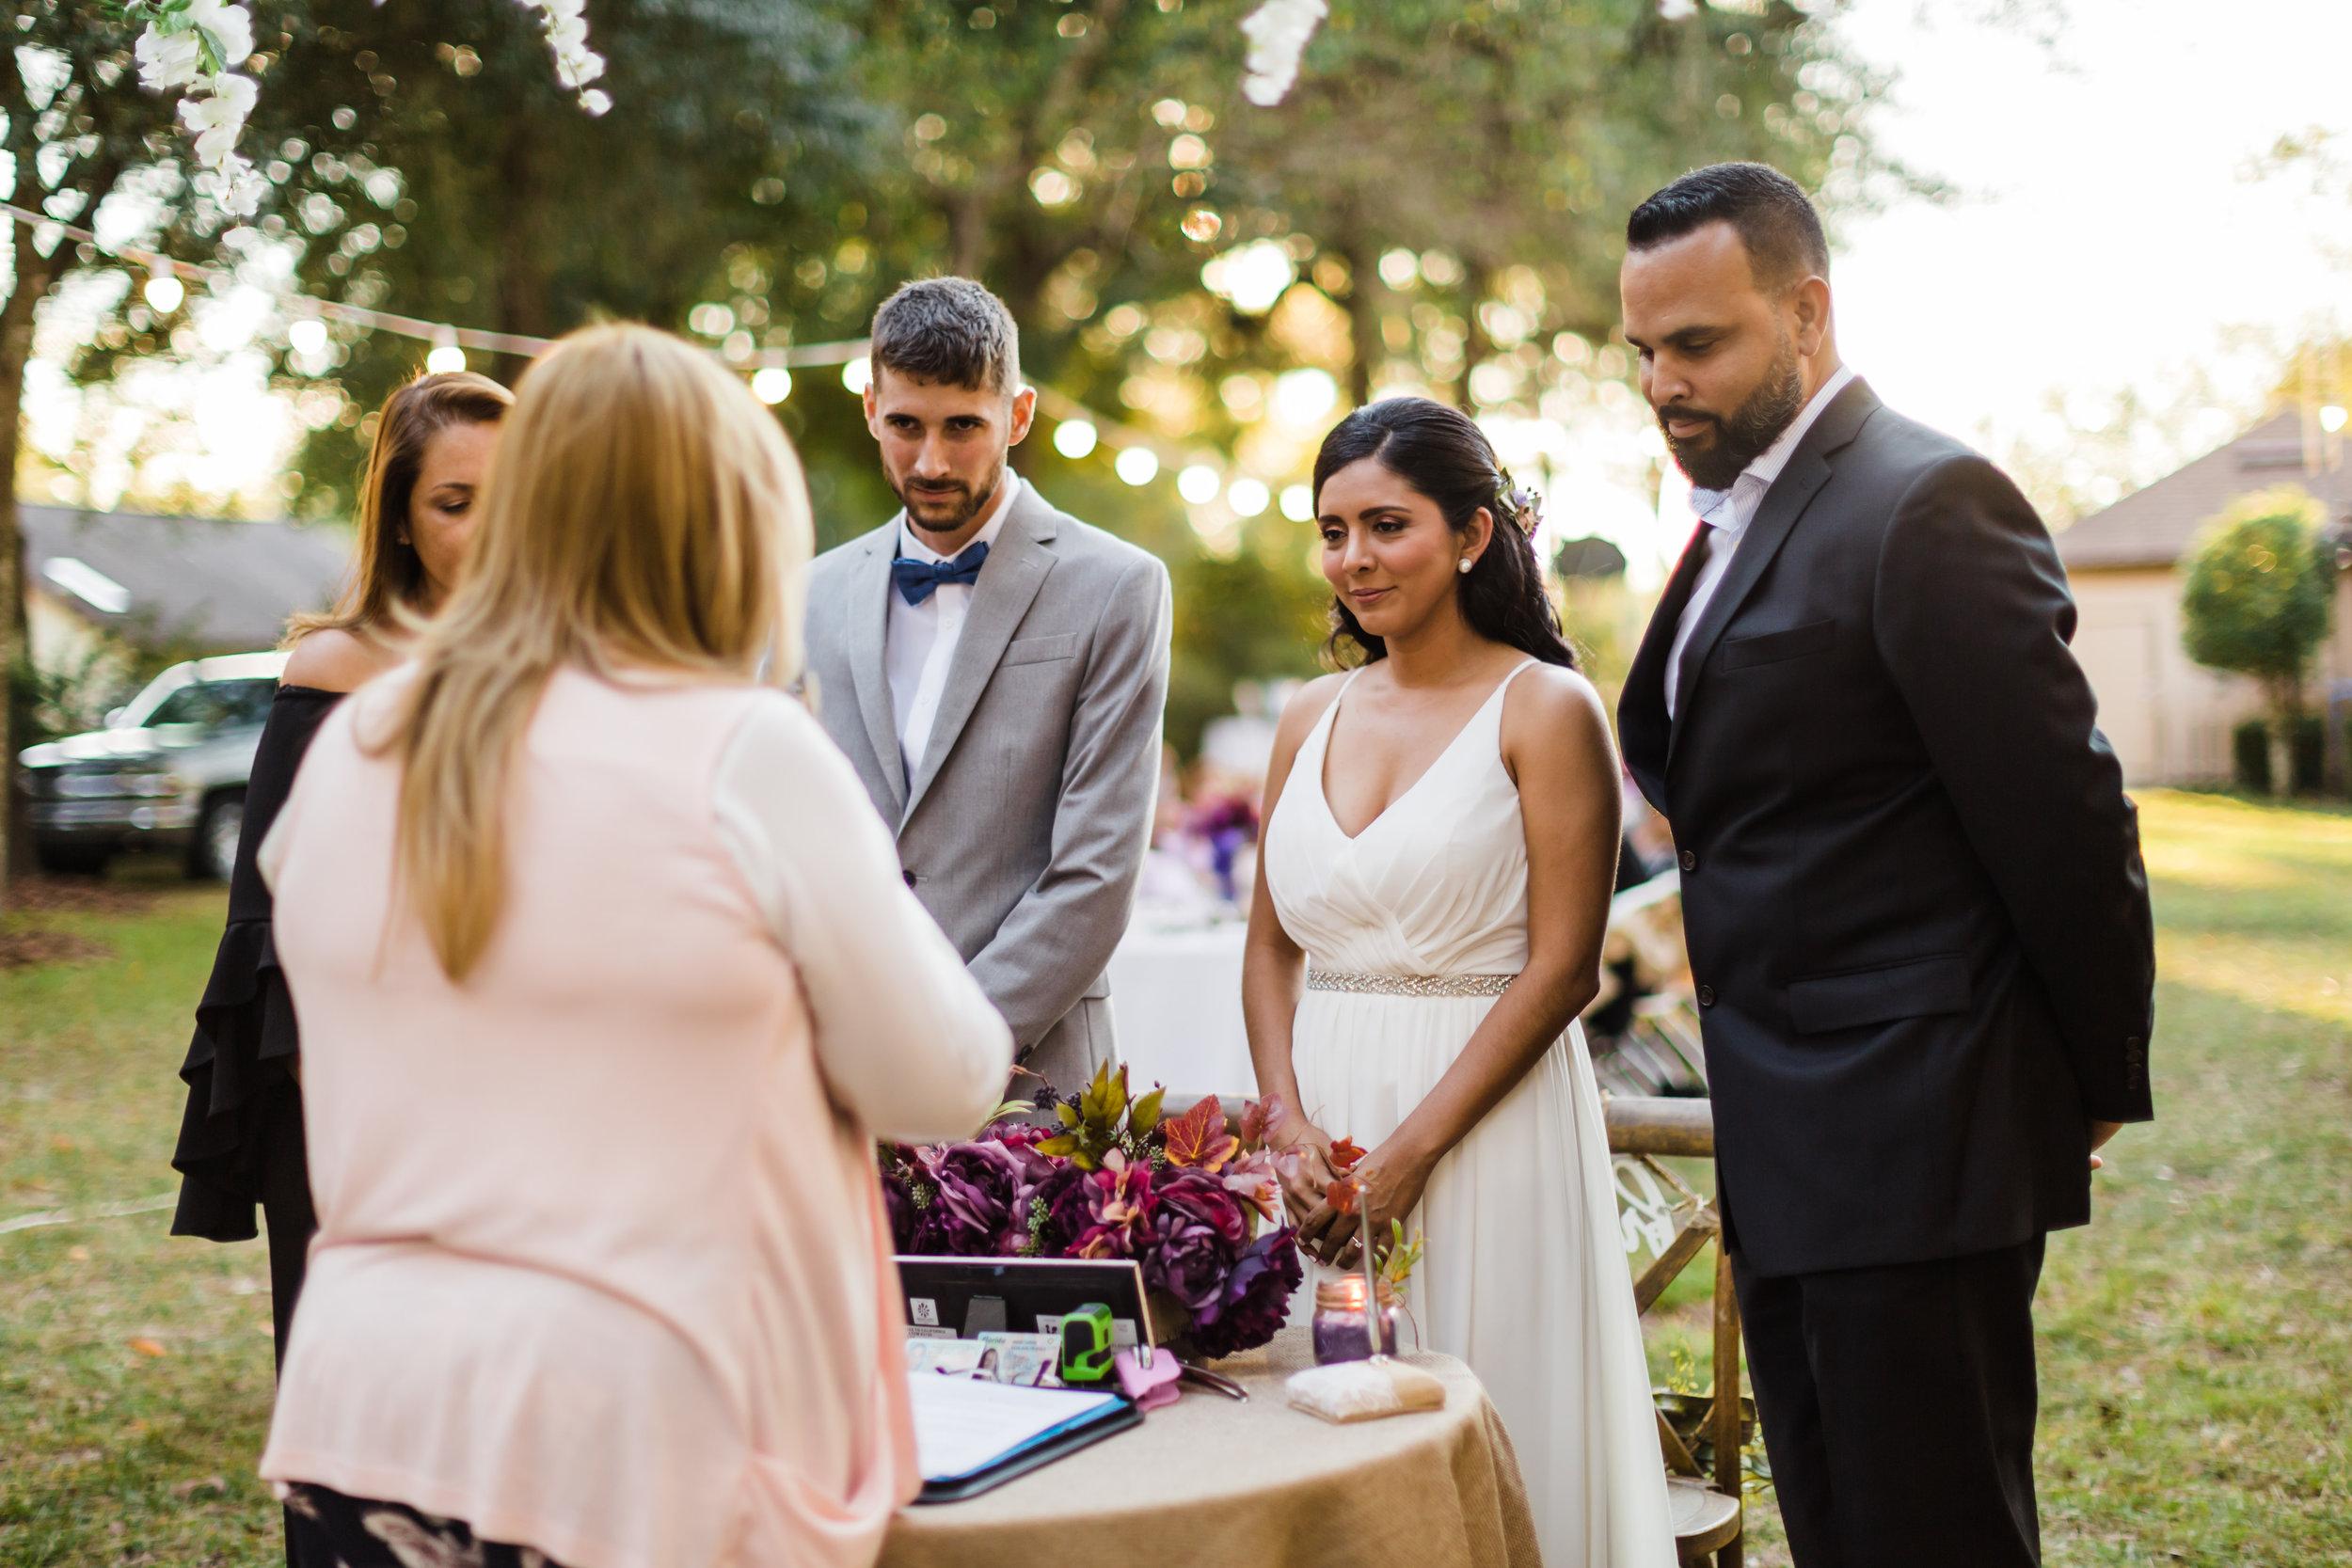 2018.11.03 Jael and Edel Ocala Wedding FINALS (215 of 441).jpg